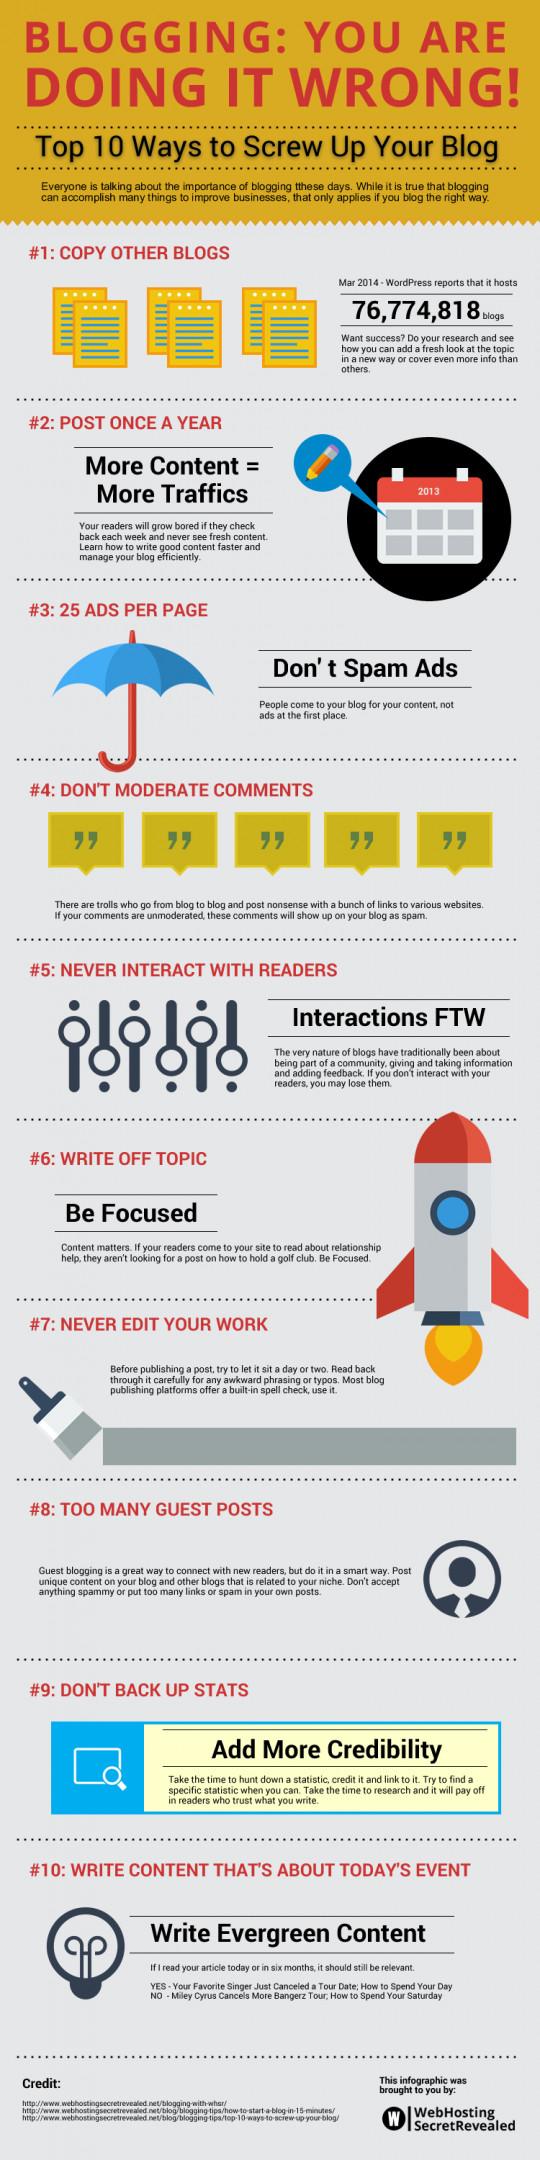 Top 10 Ways To Screw Up Your Blog